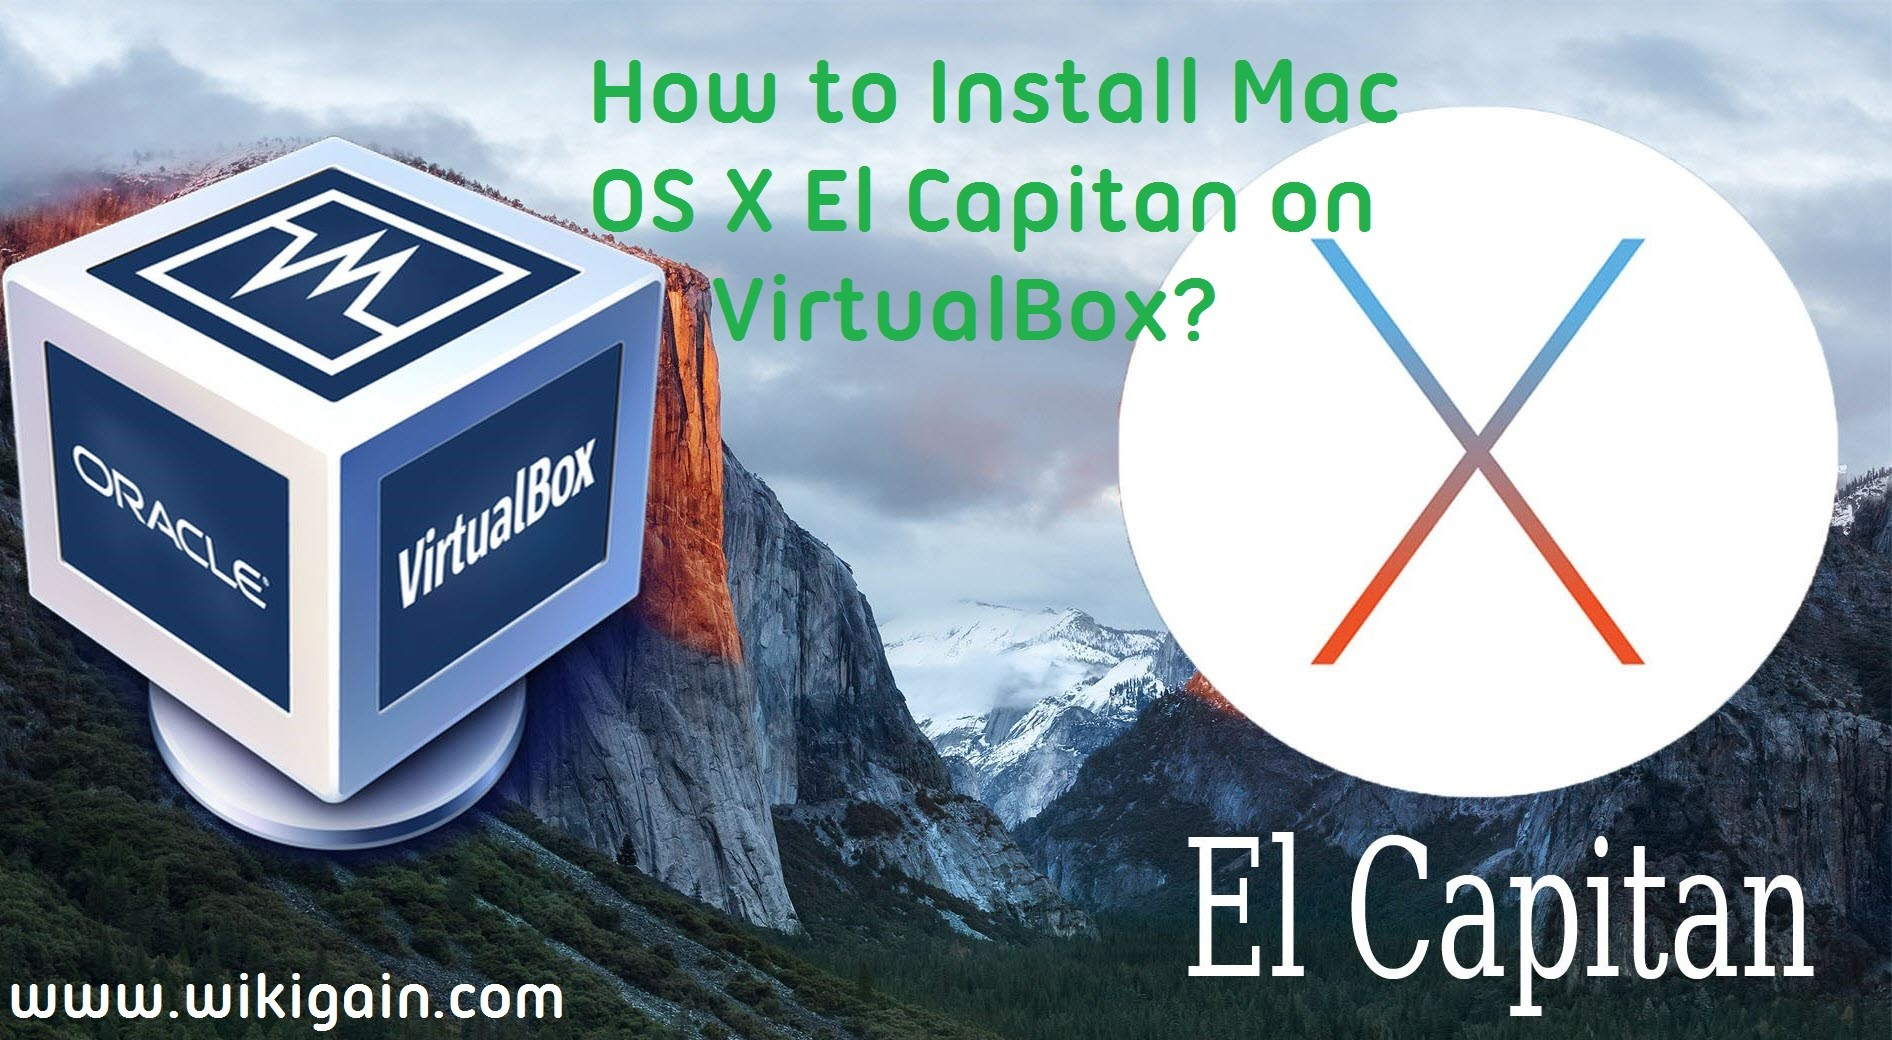 Apple Mac OS Training Courses - Learn Mac OS X Sierra, Mac ...